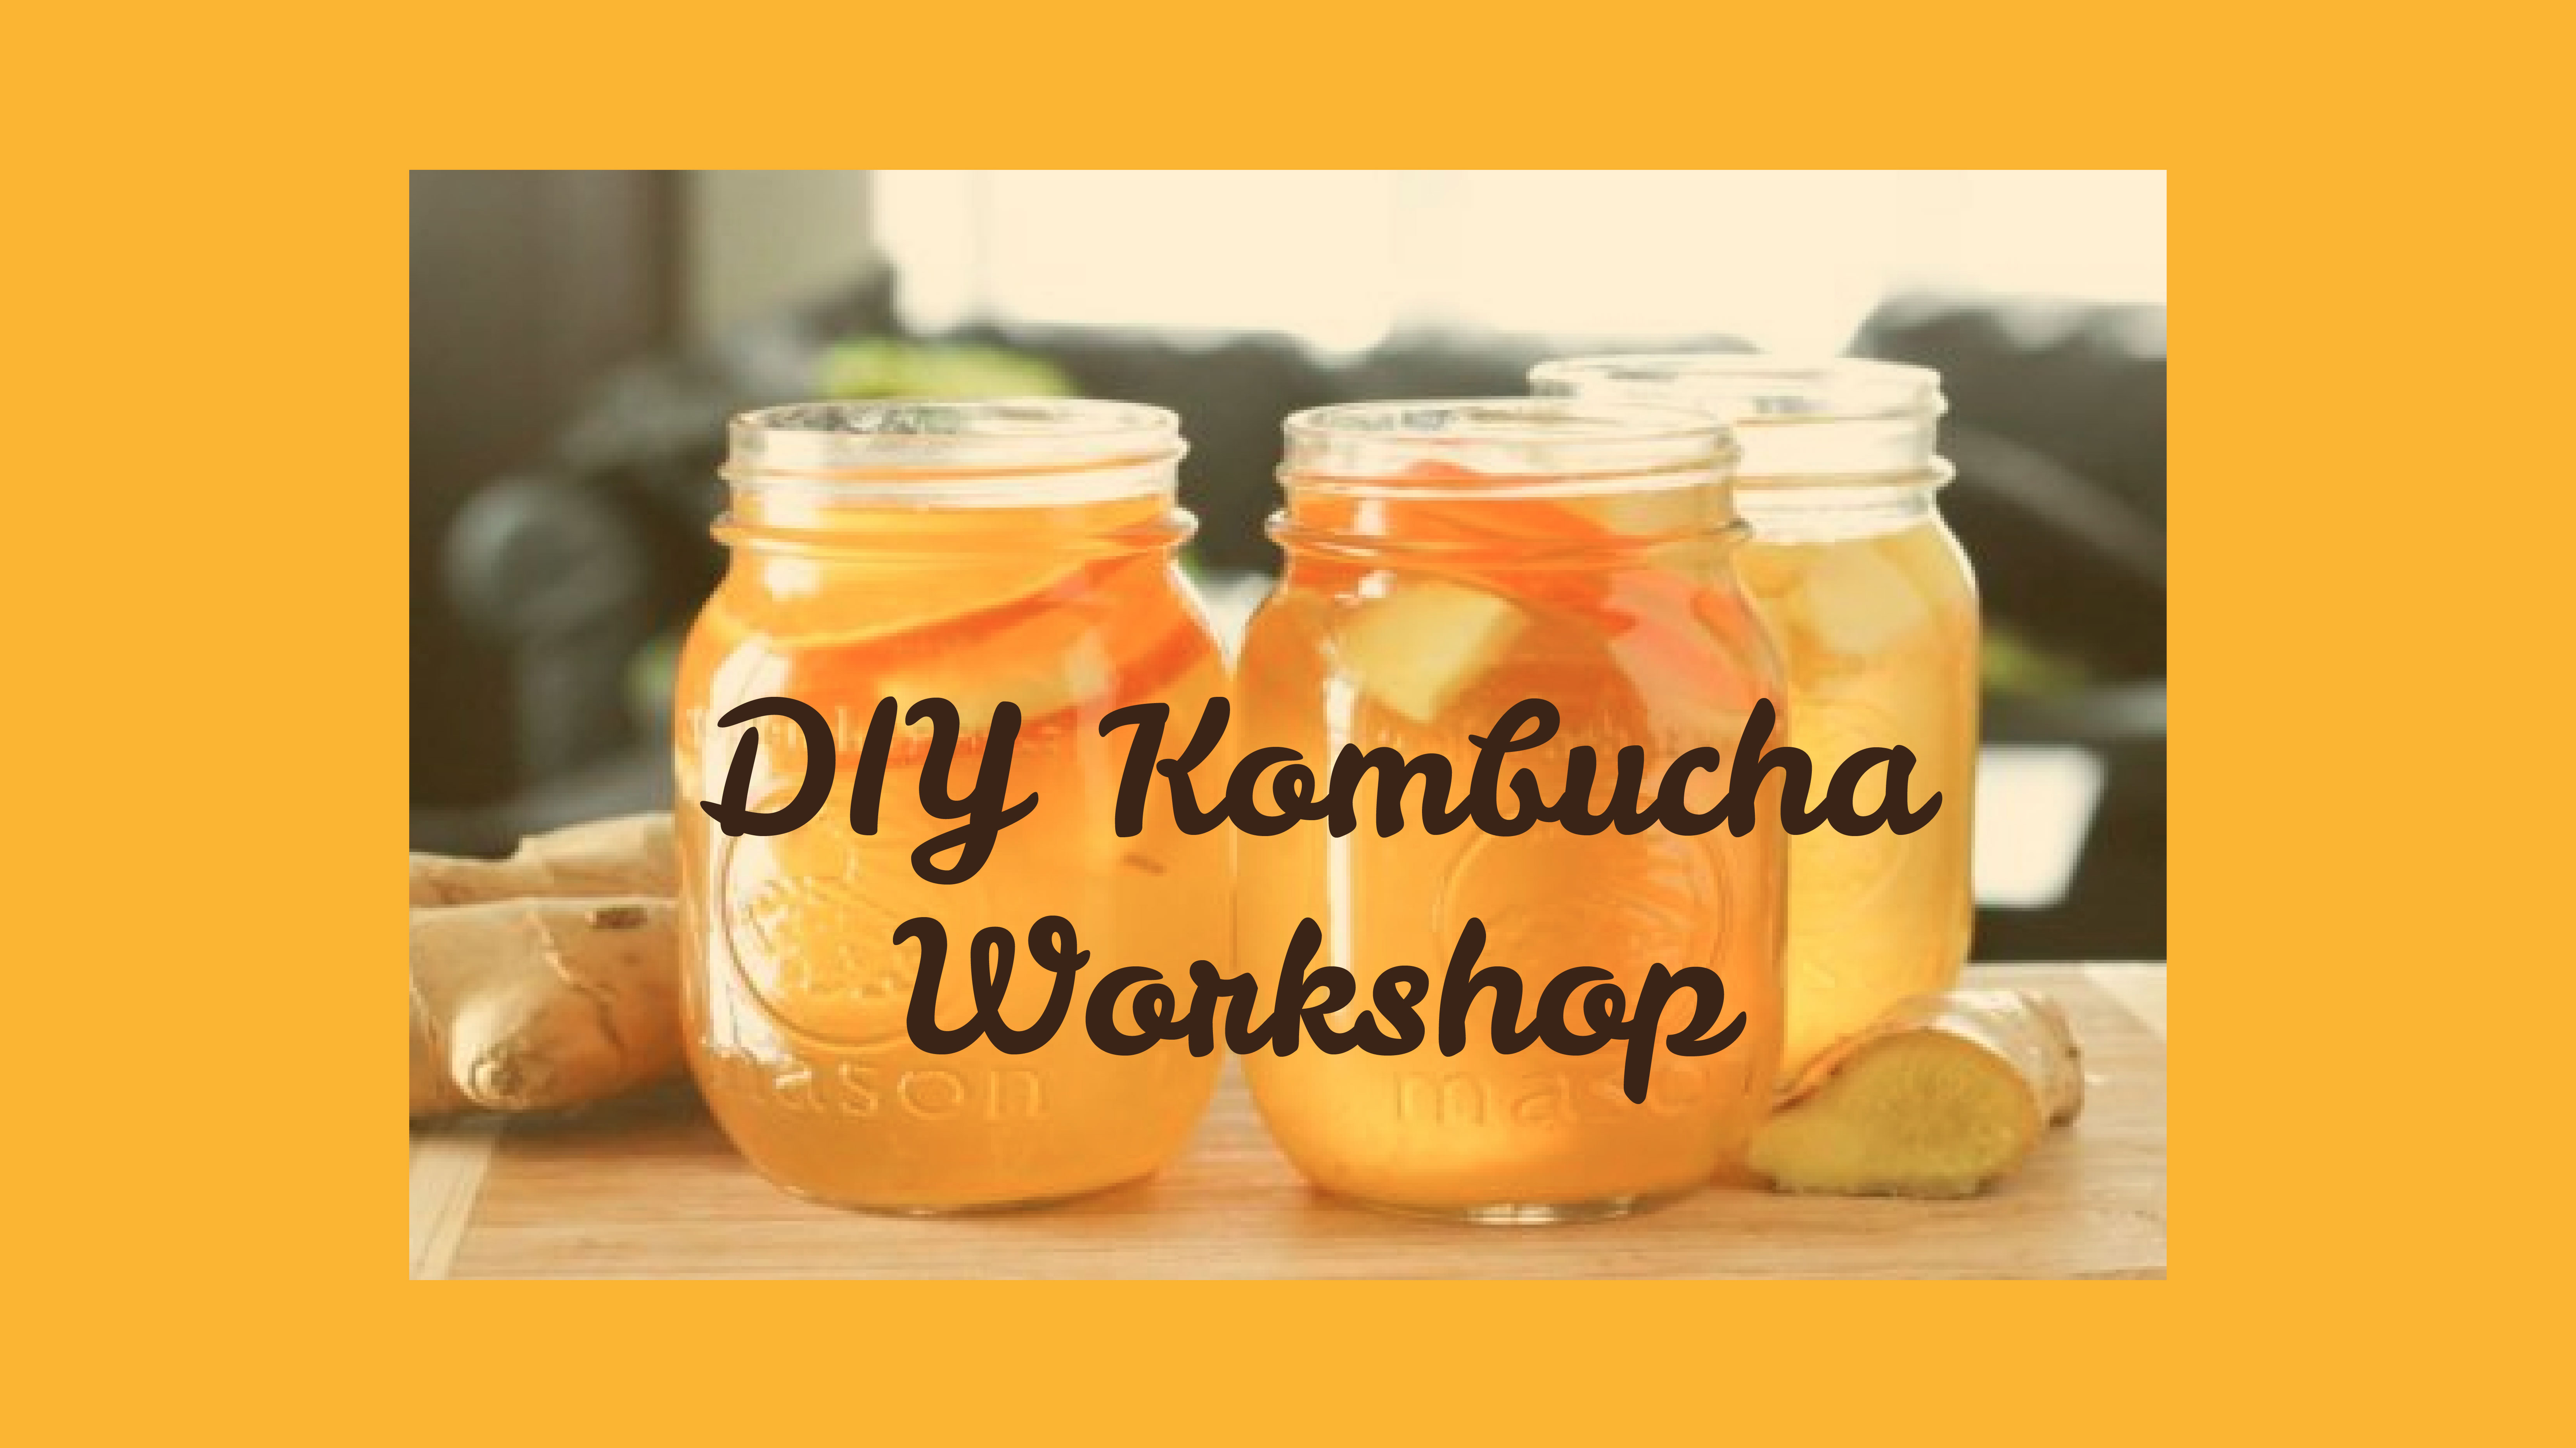 KombuchaWorkshop-01.jpg